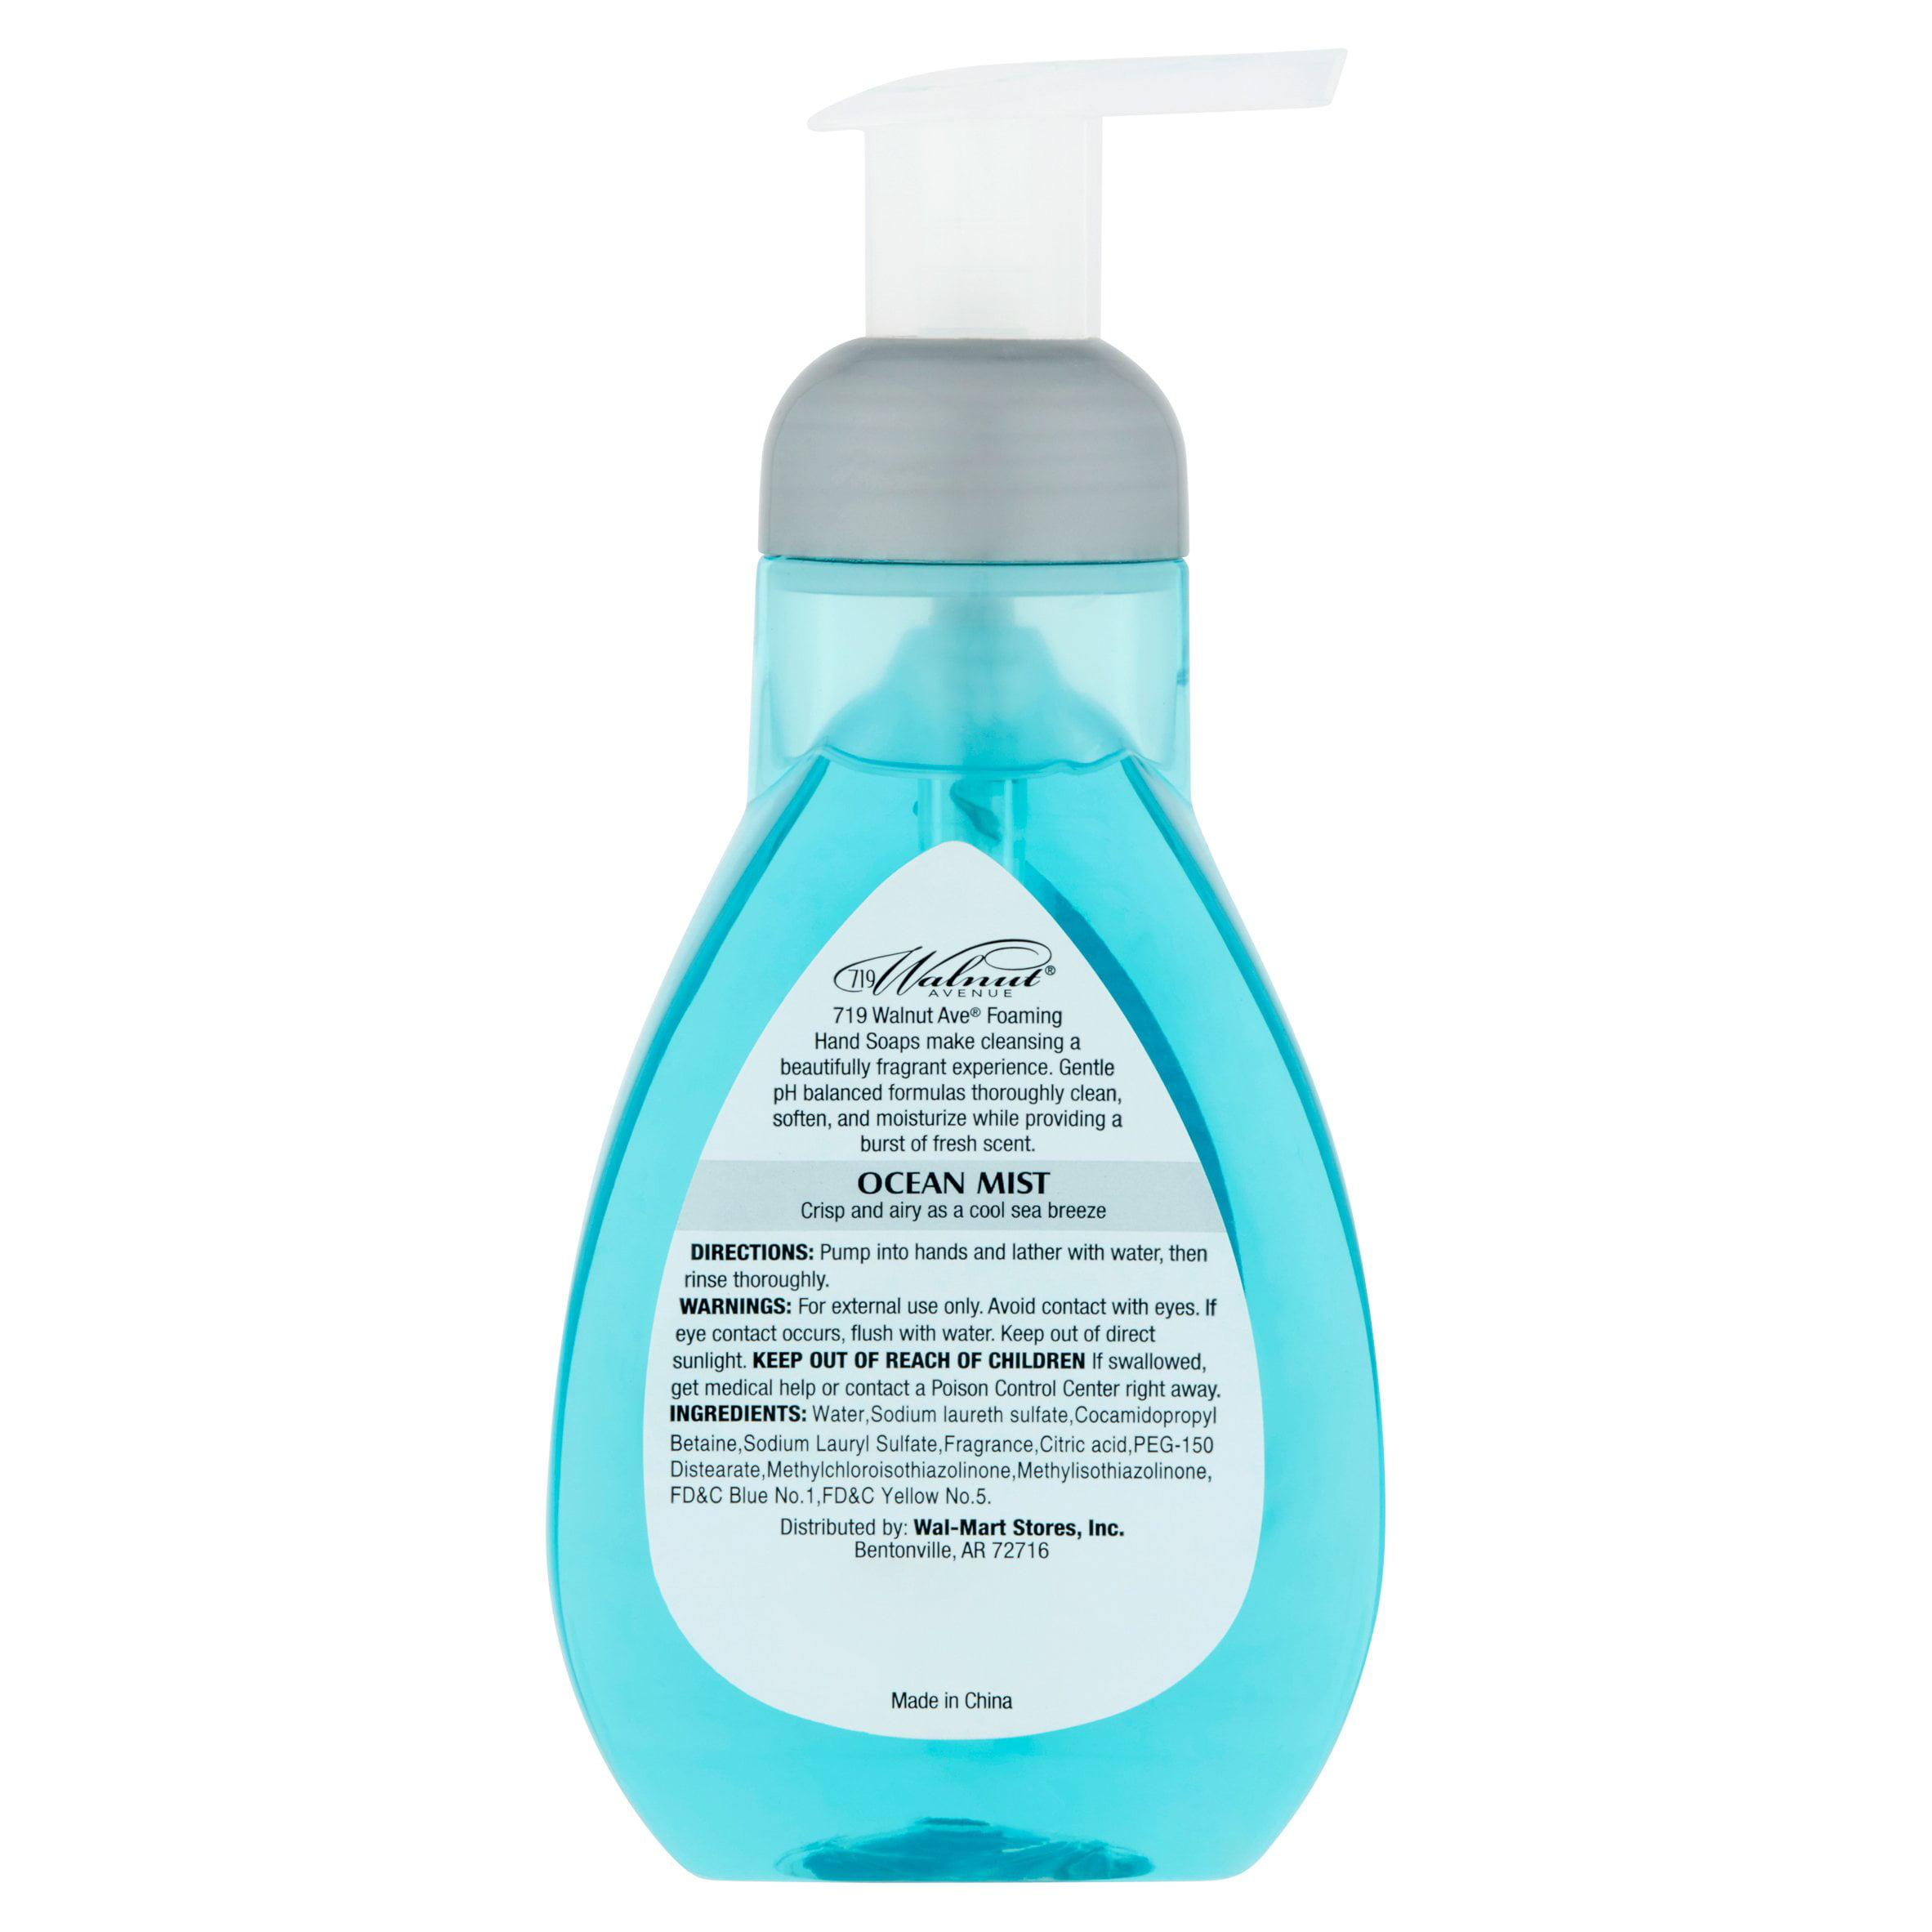 719 Walnut Avenue Ocean Mist Foaming Hand Soap, 12 fl oz - Walmart.com